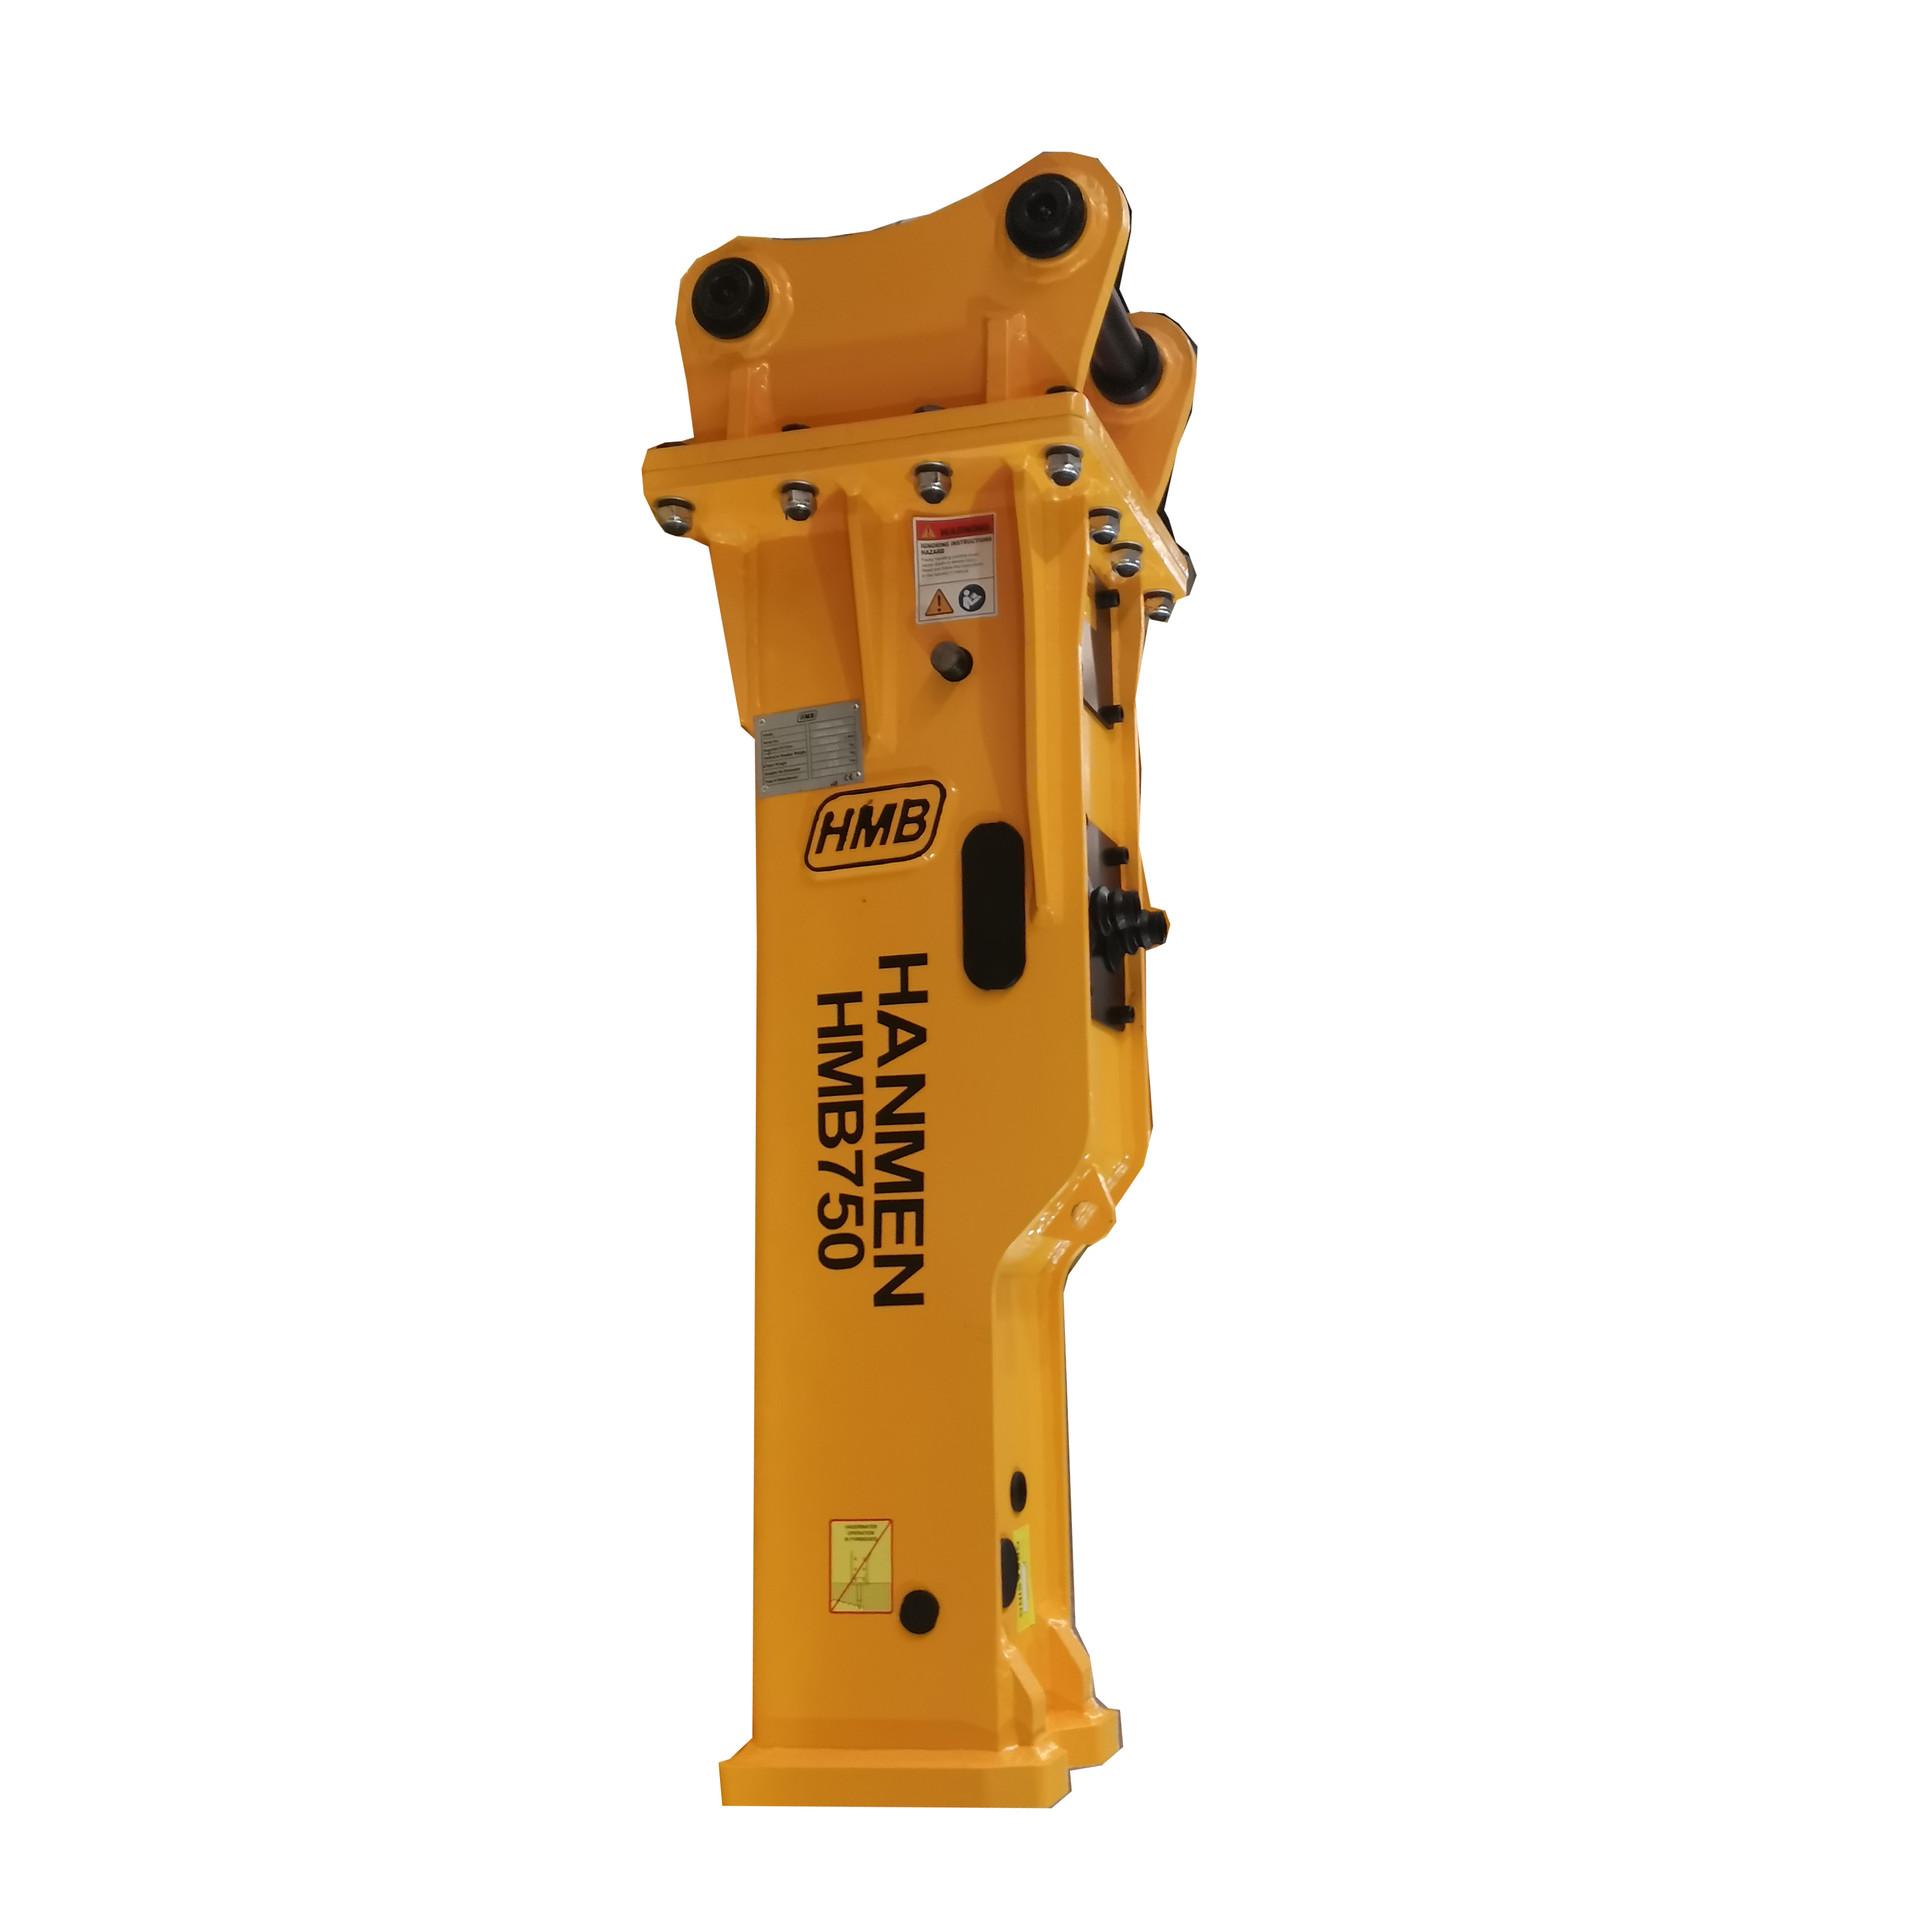 100mm chisel PC100 Silent Type Excavator Demolition Hydraulic Hammer Breaker for 10-15 ton excavator